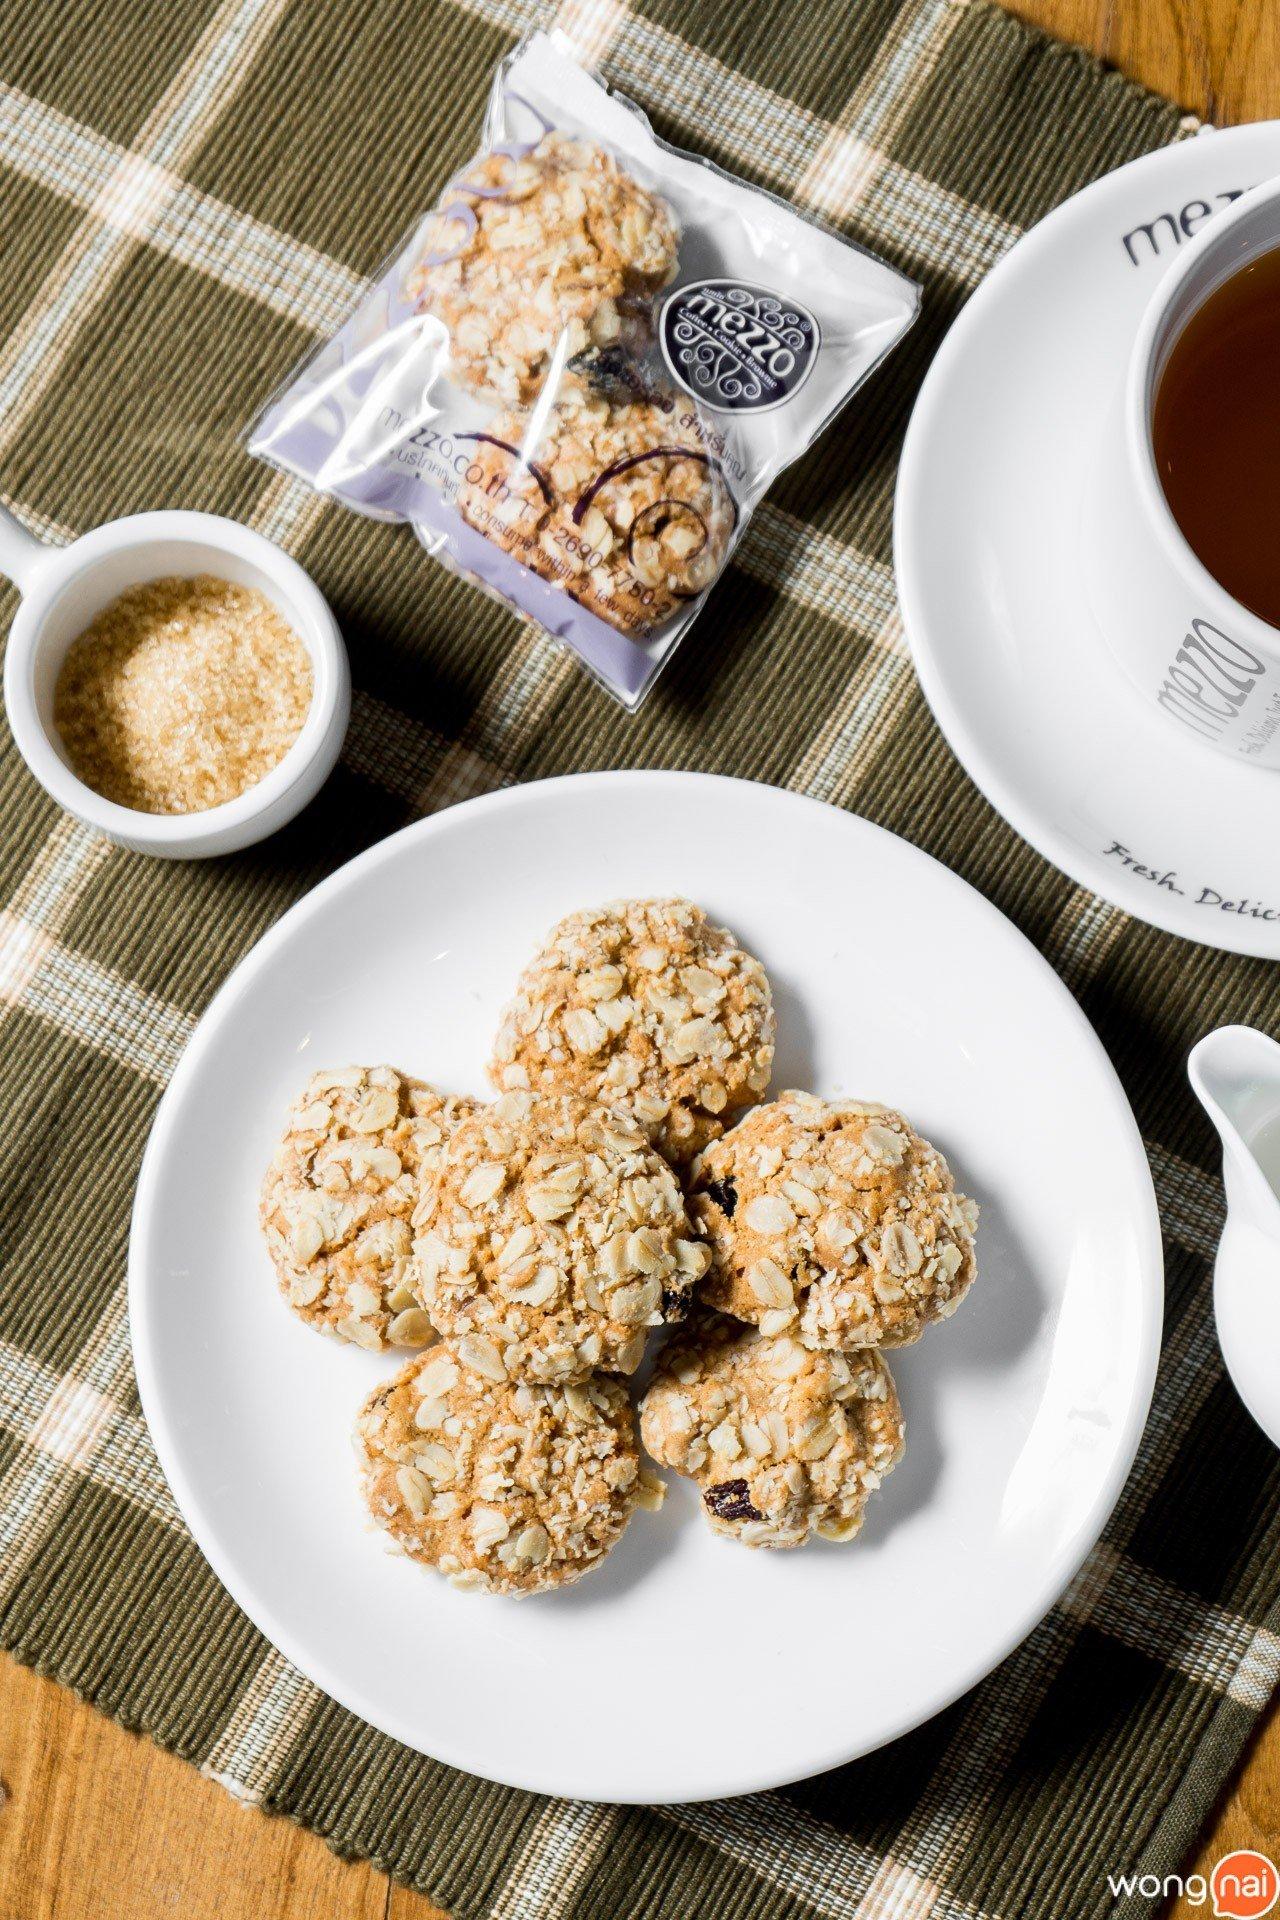 Cookies Oatmeal Raisins ของ ร้านกาแฟและเบเกอรี Mezzo Coffee